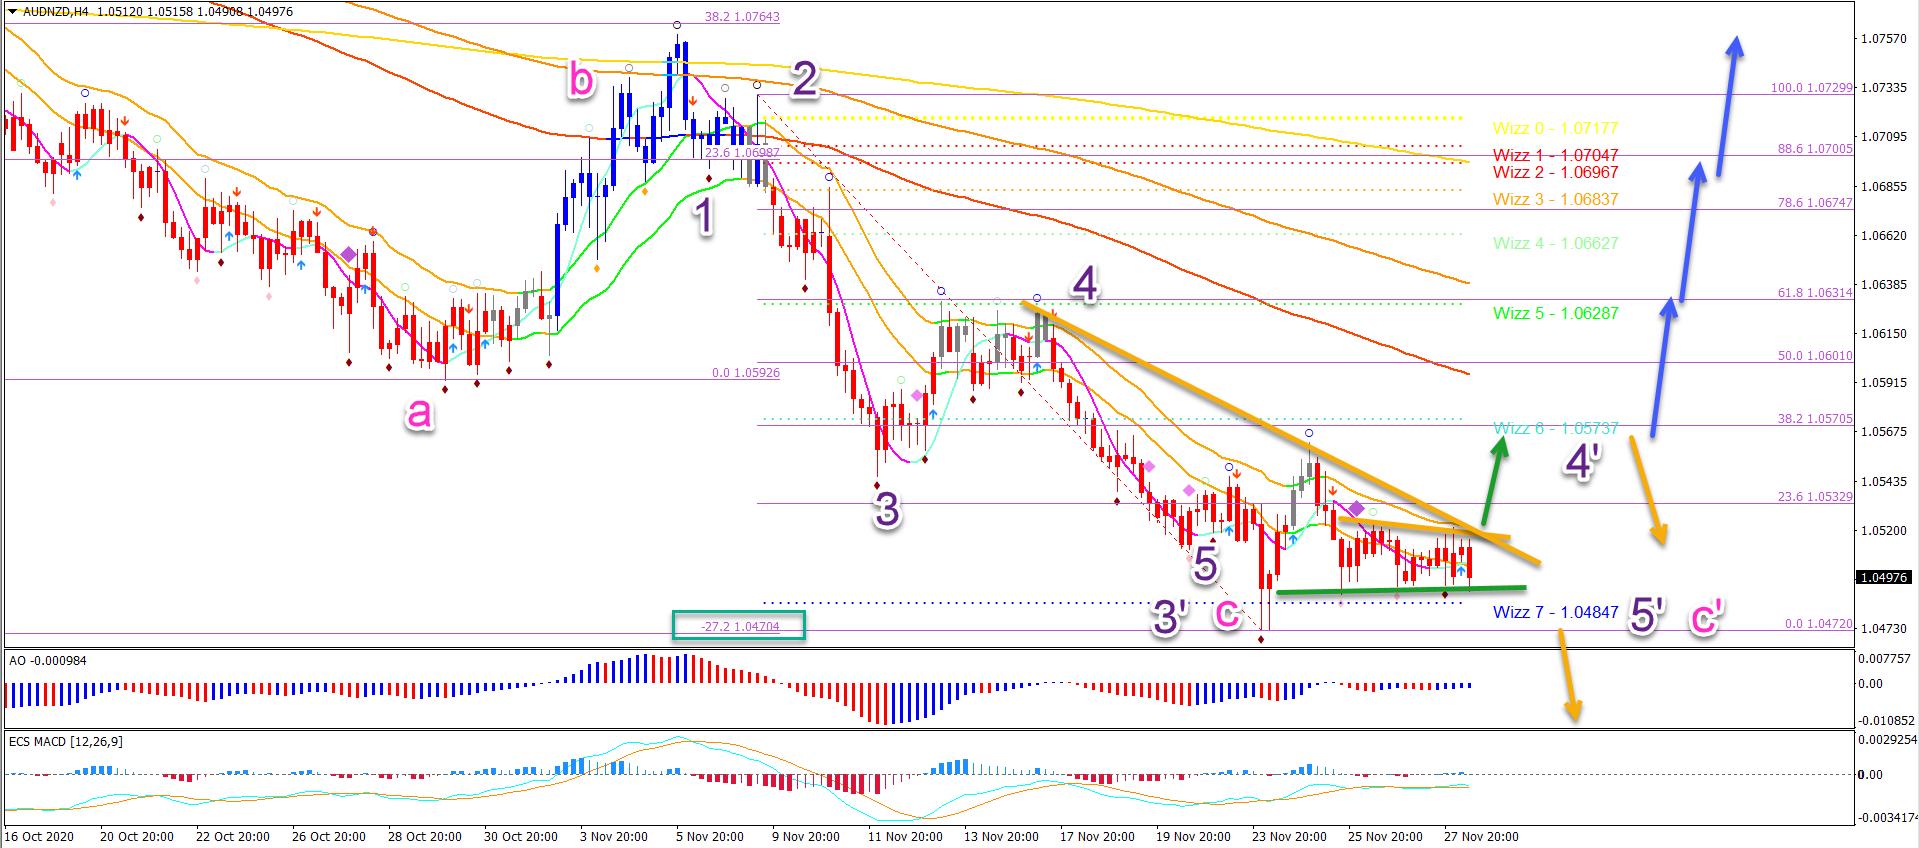 AUD/NZD 4 hour chart 30.11.20